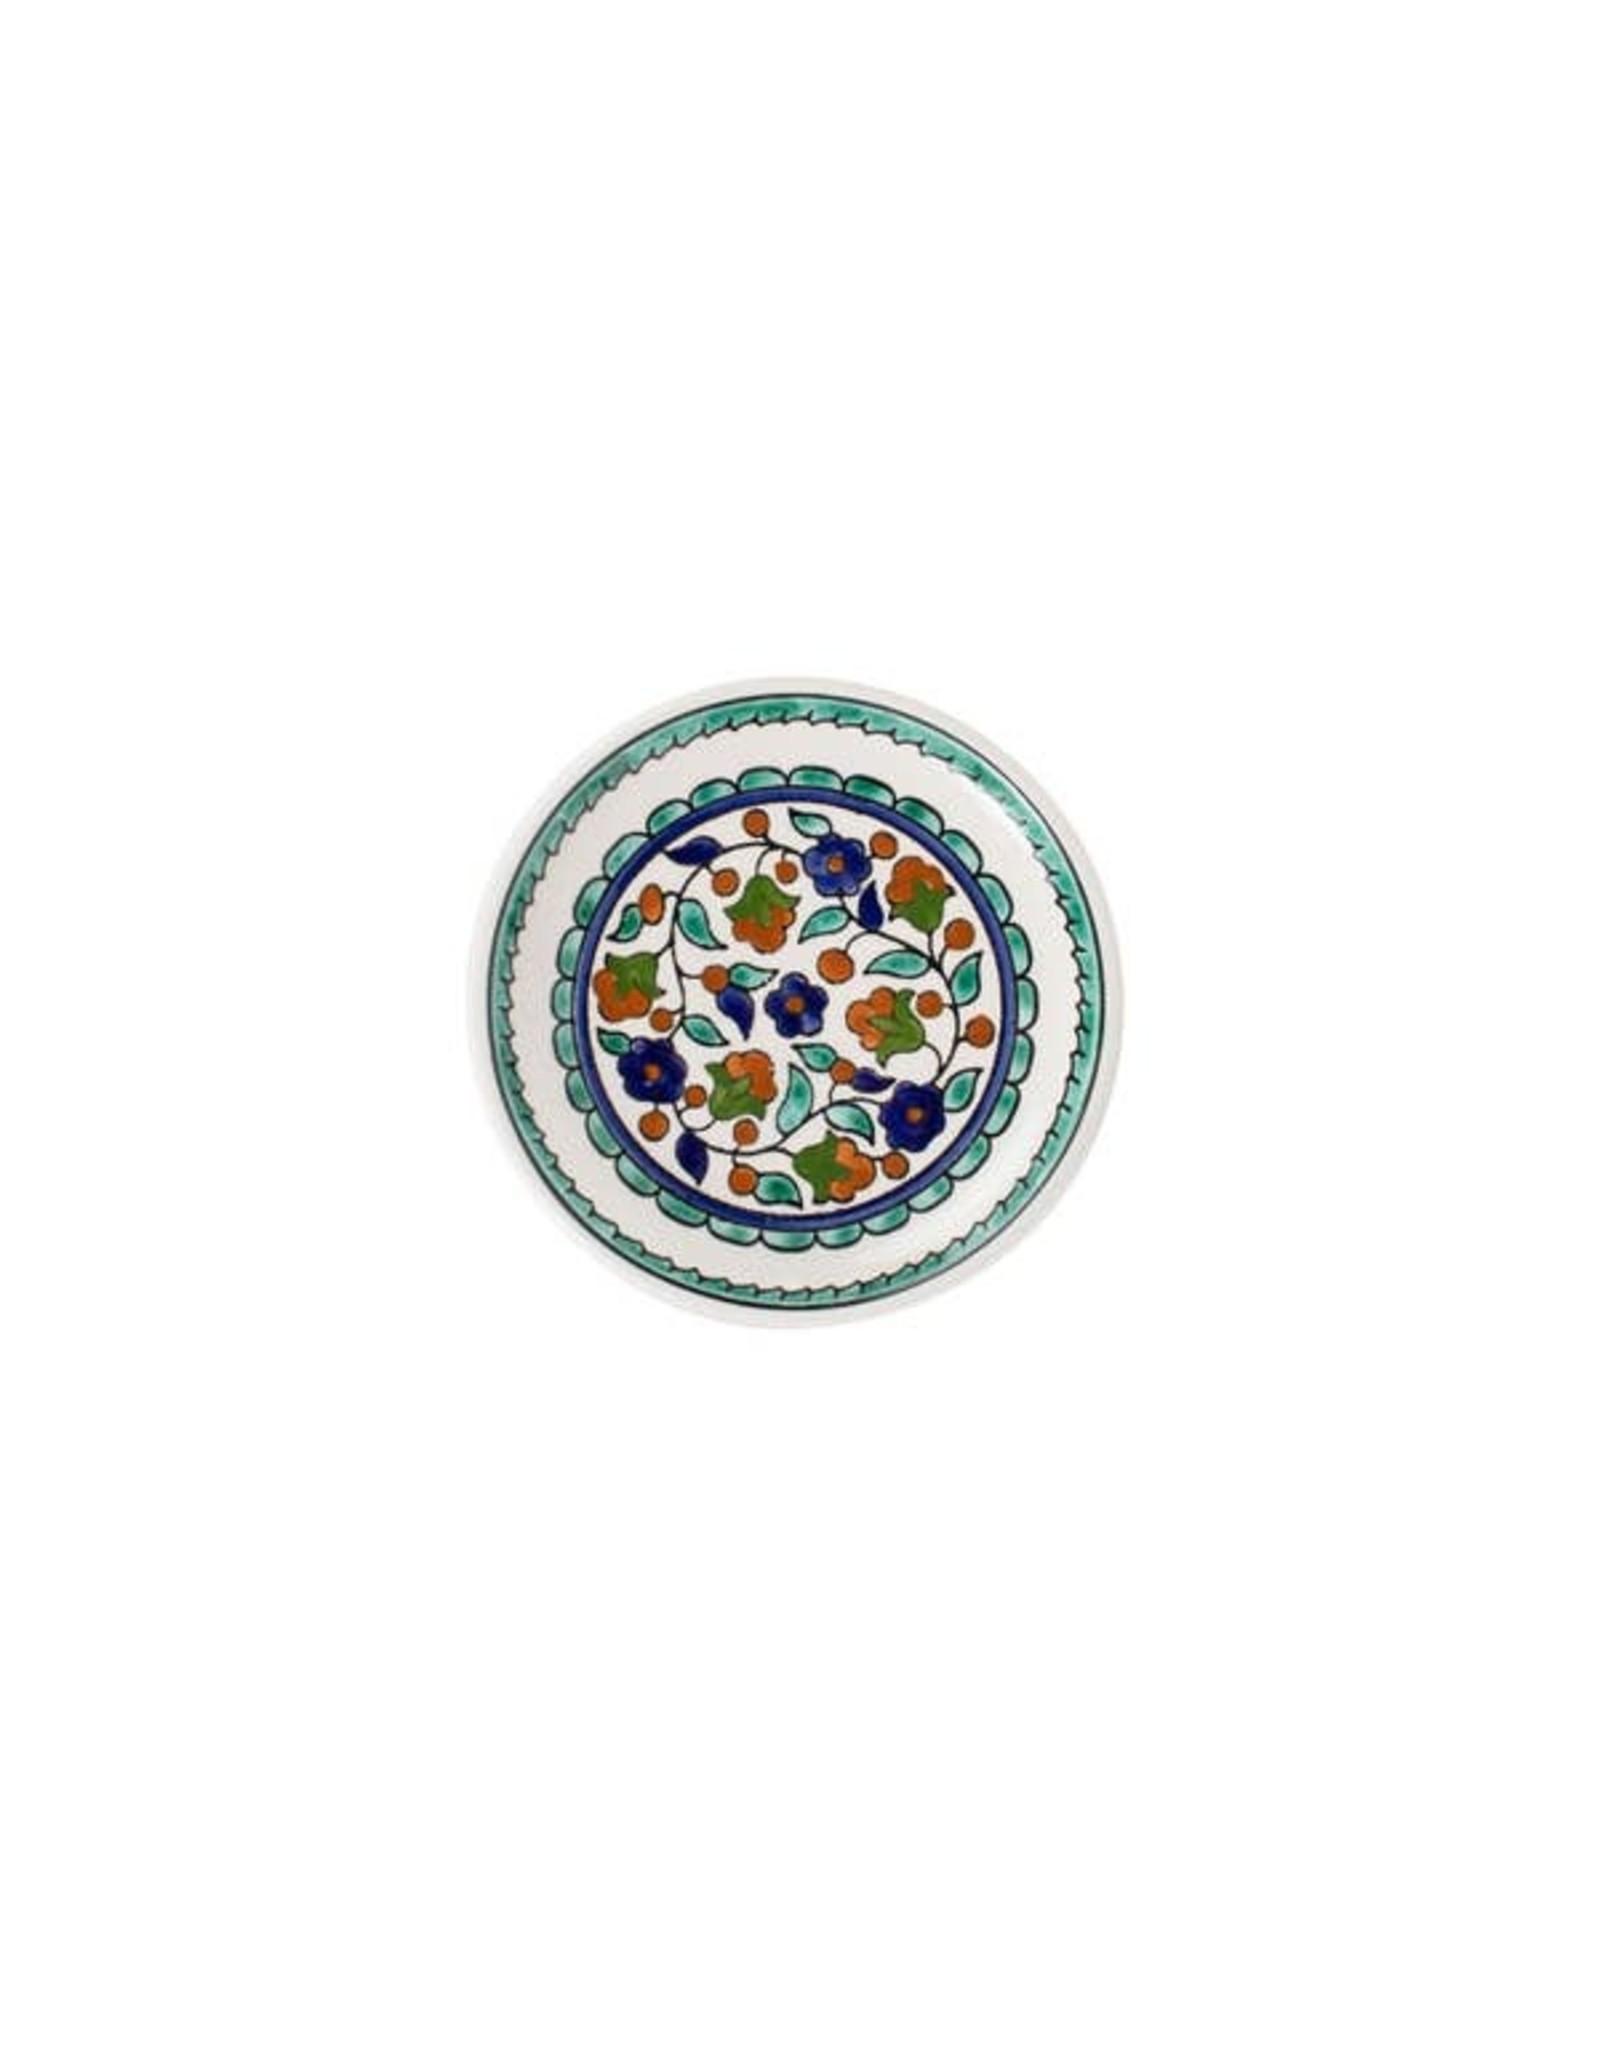 Folklore Ceramic Dish, West Bank